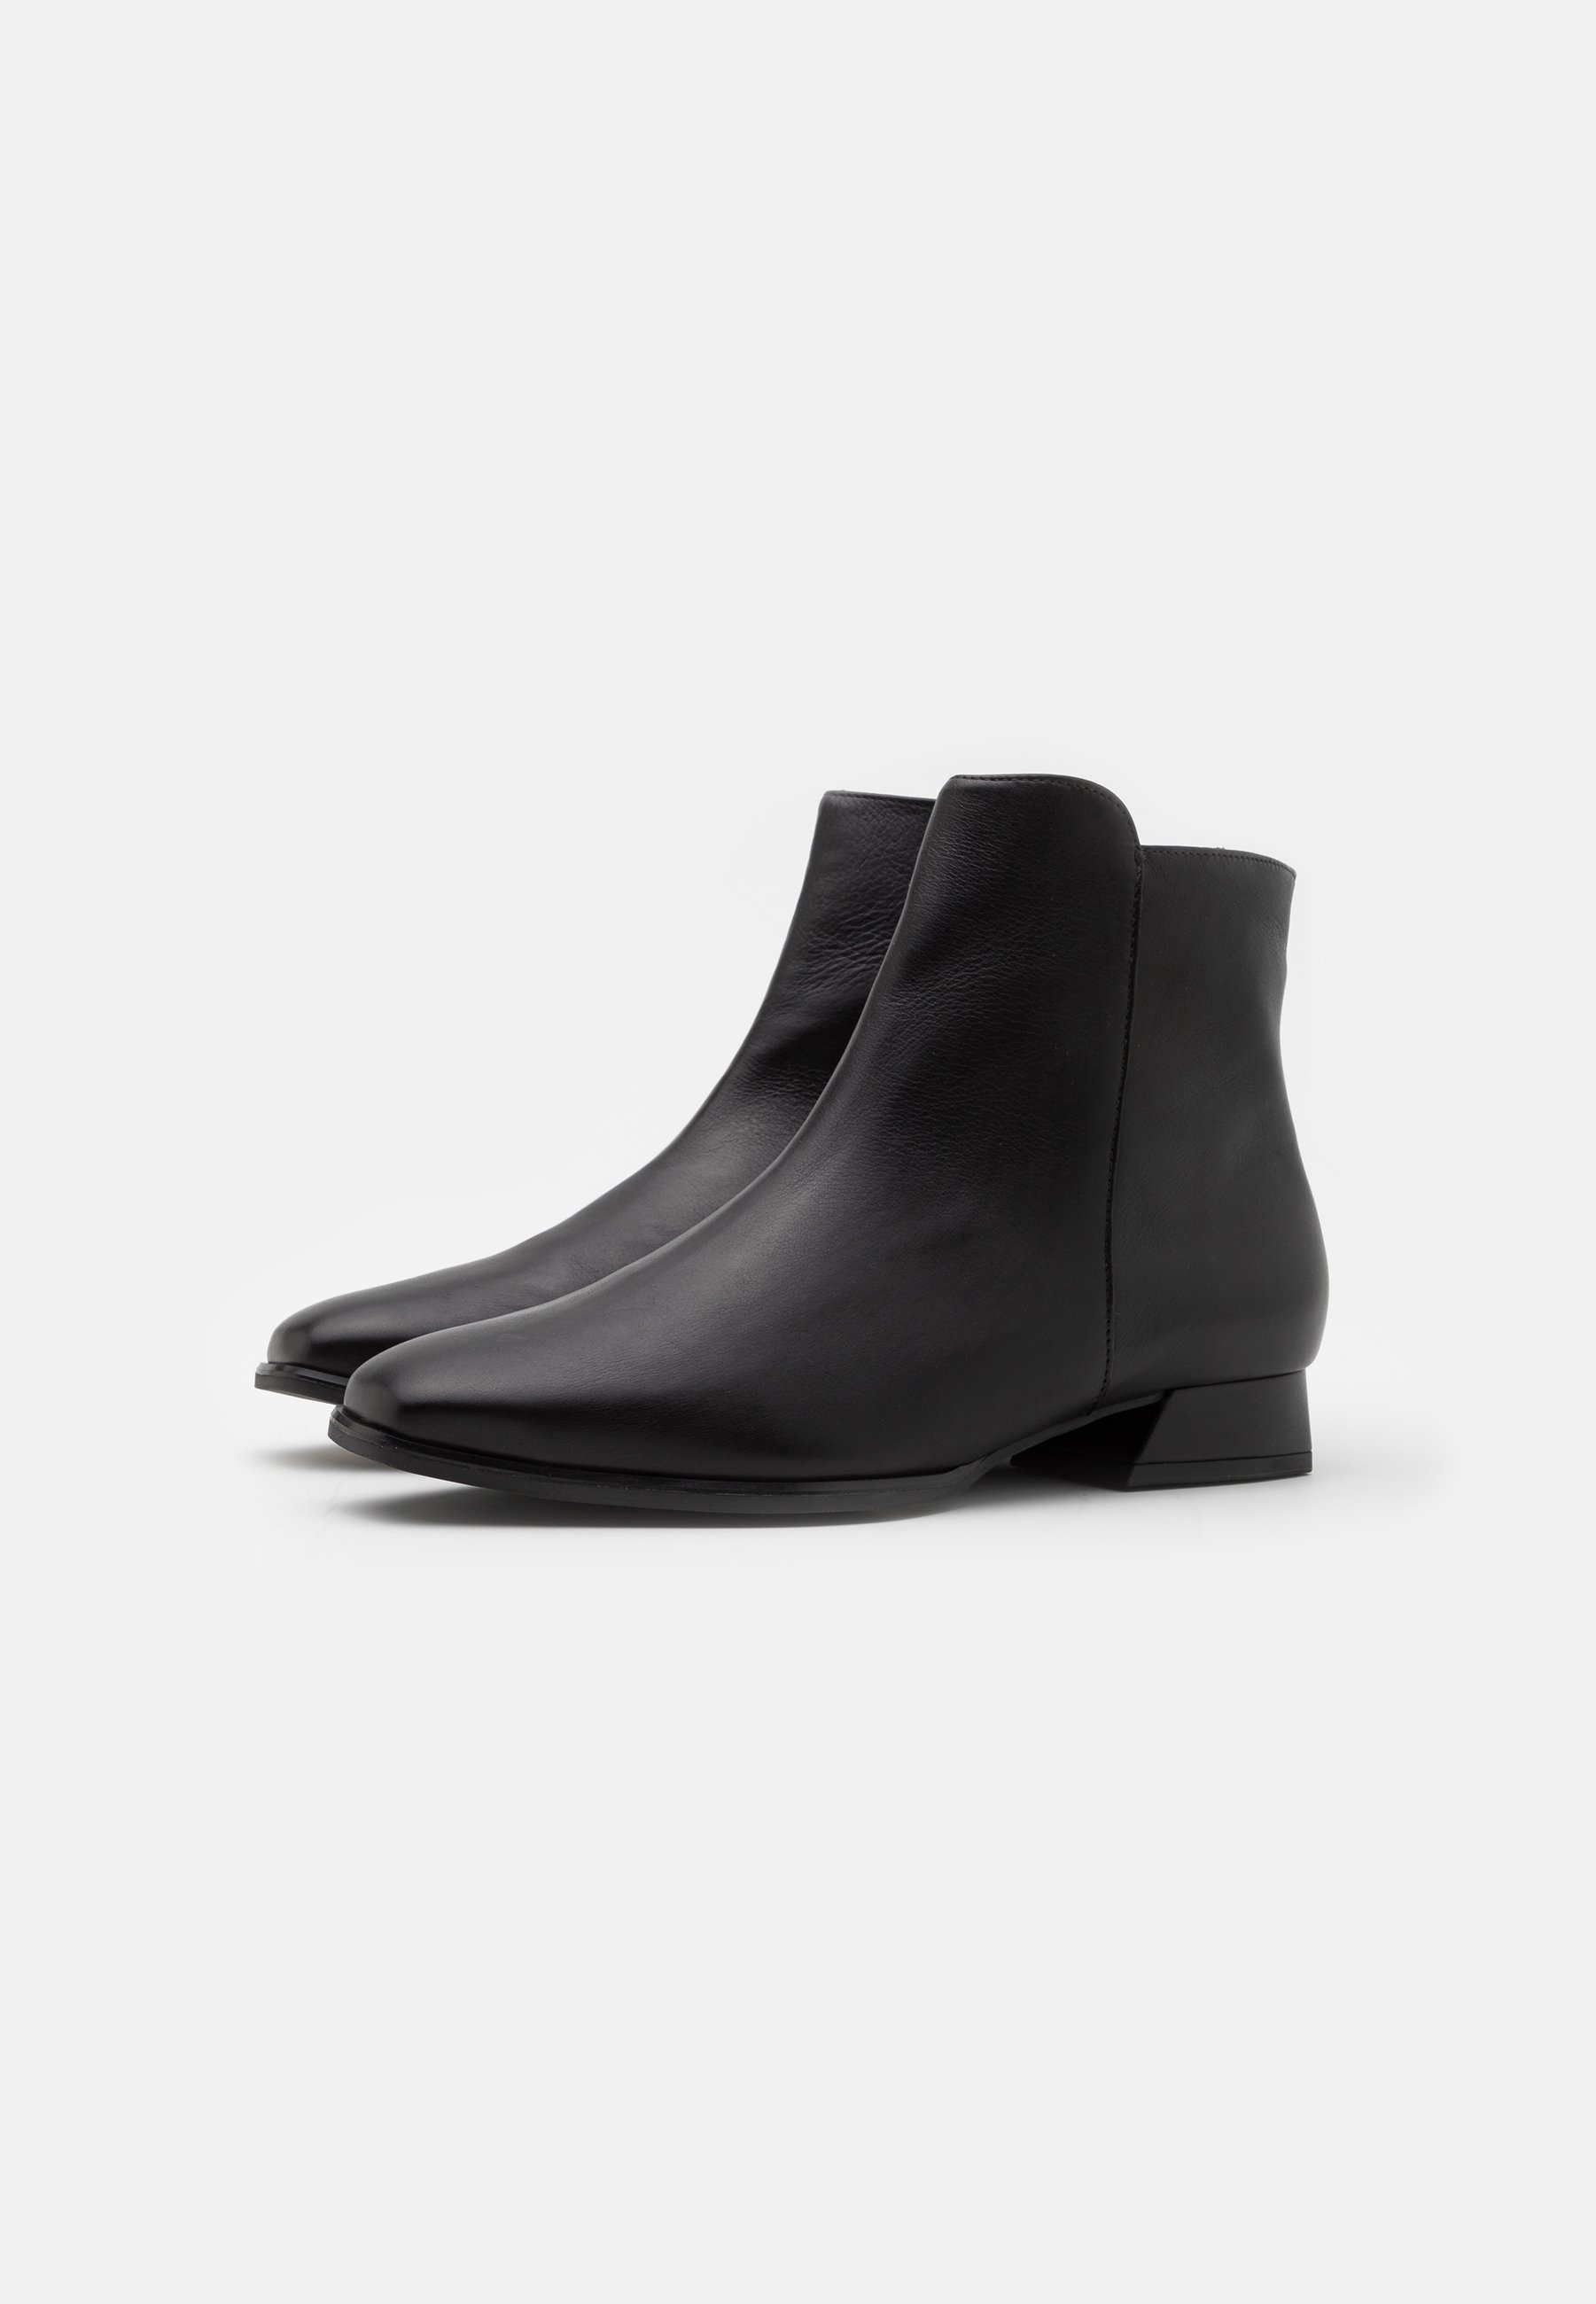 Peter Kaiser LARIA - Stiefelette - schwarz mellow | Damen Schuhe 2020